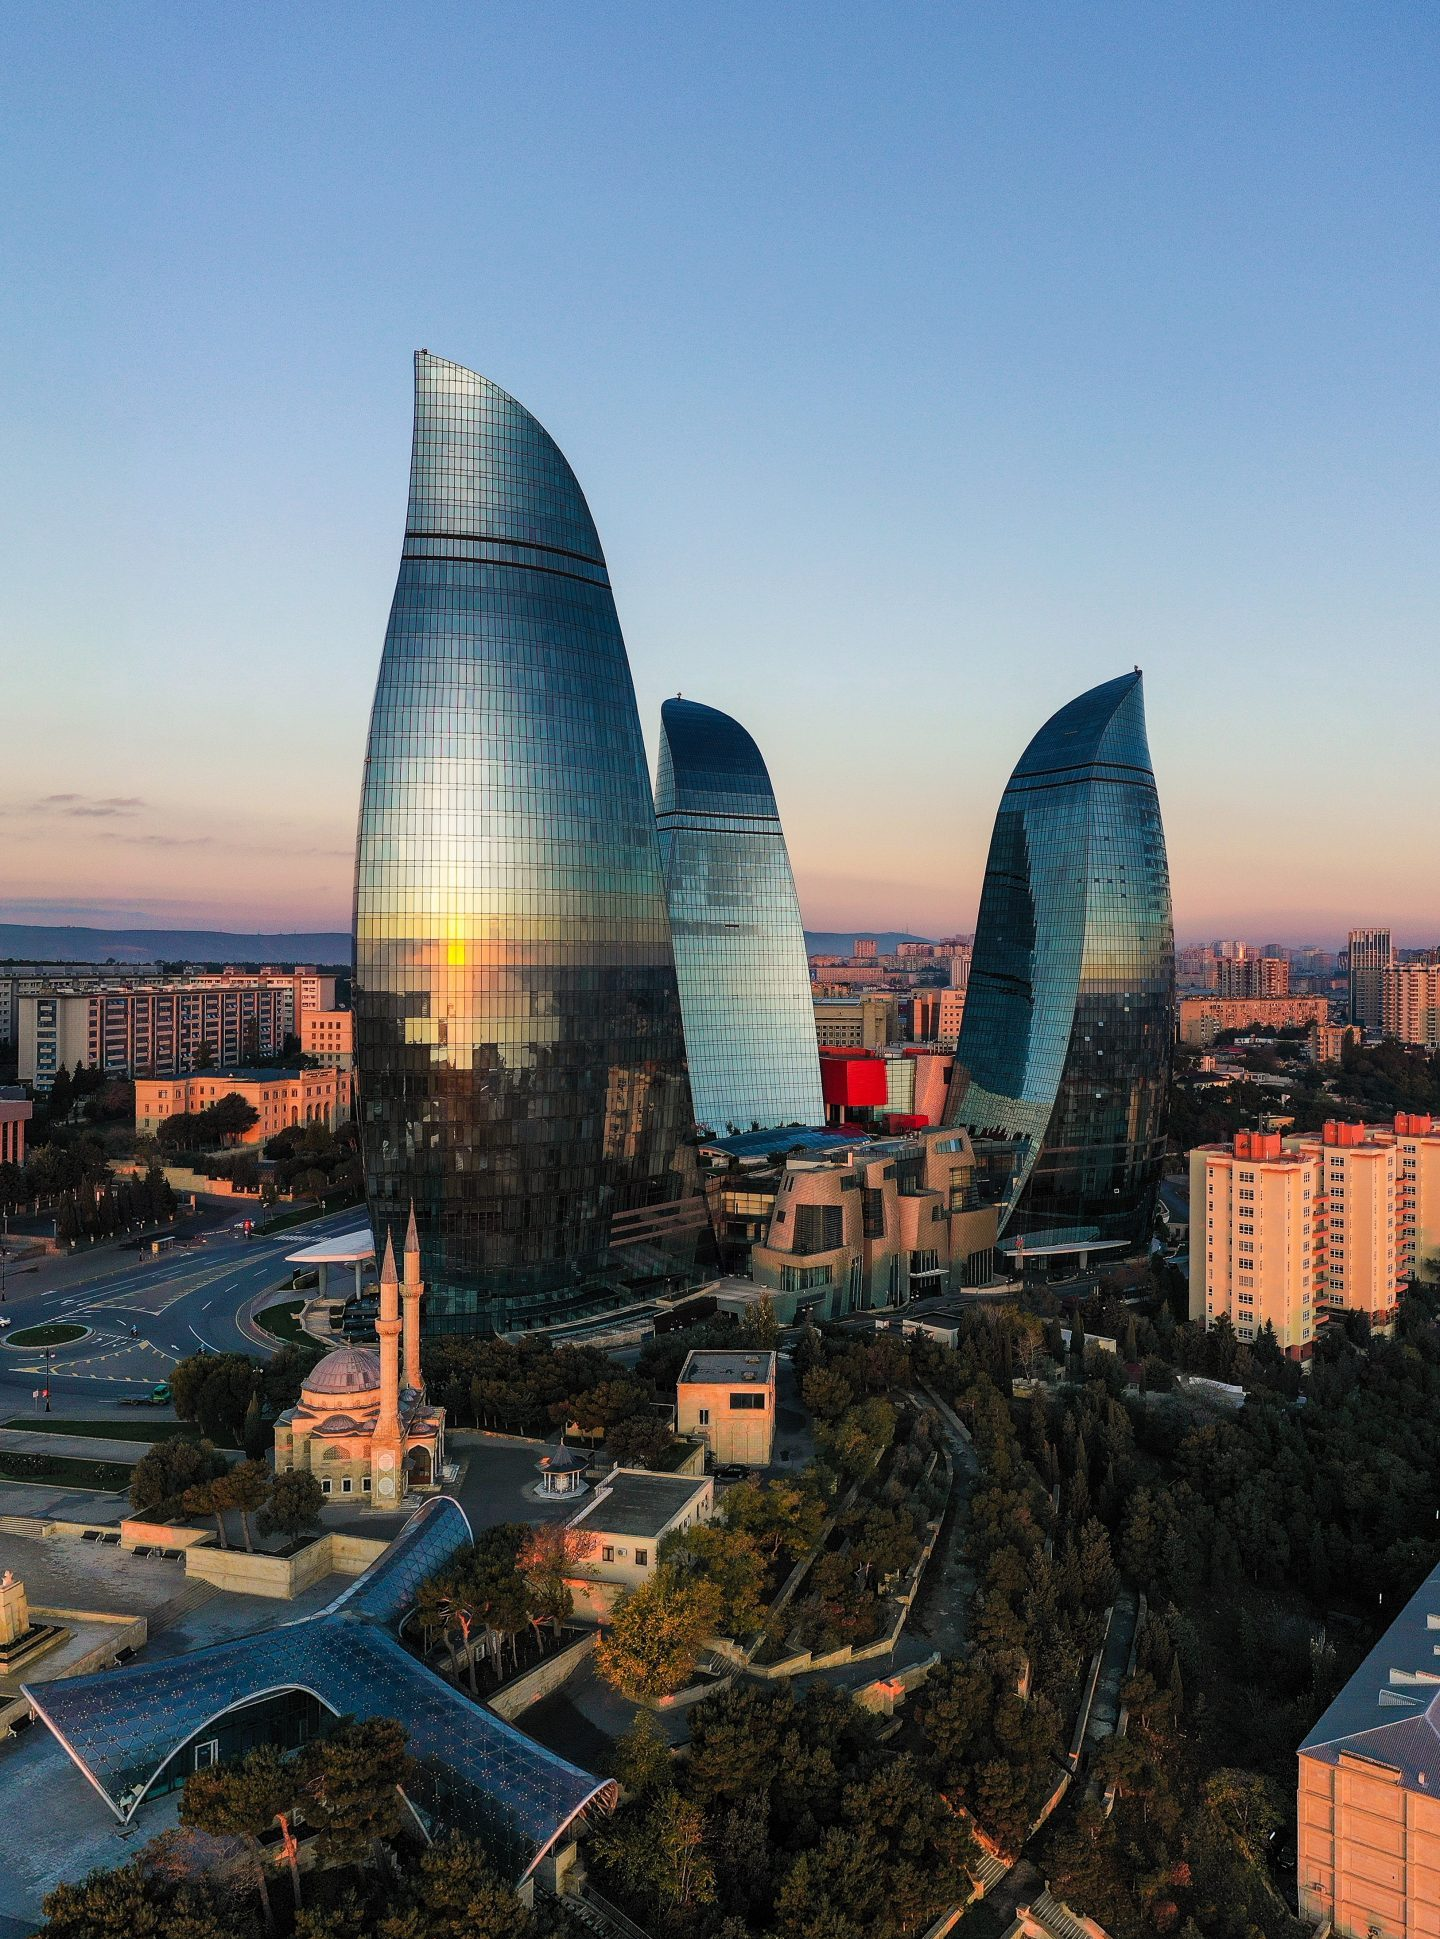 Baku Azerbaijan, underrated city